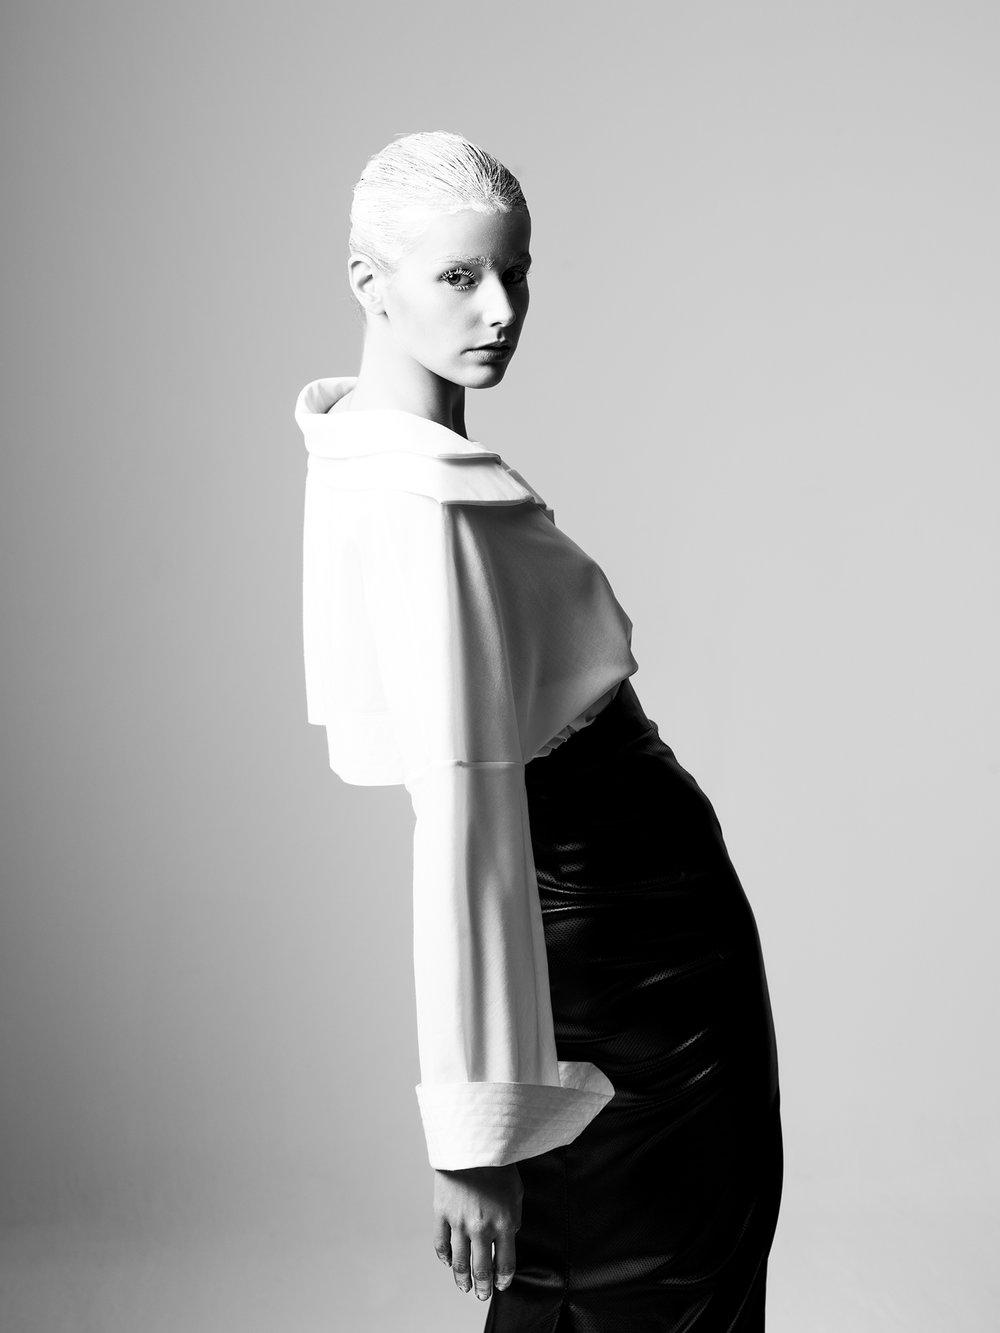 Oscar-arribas-photography-fotografo-portrait-retrato-editorial-fashion-beauty-05.jpg